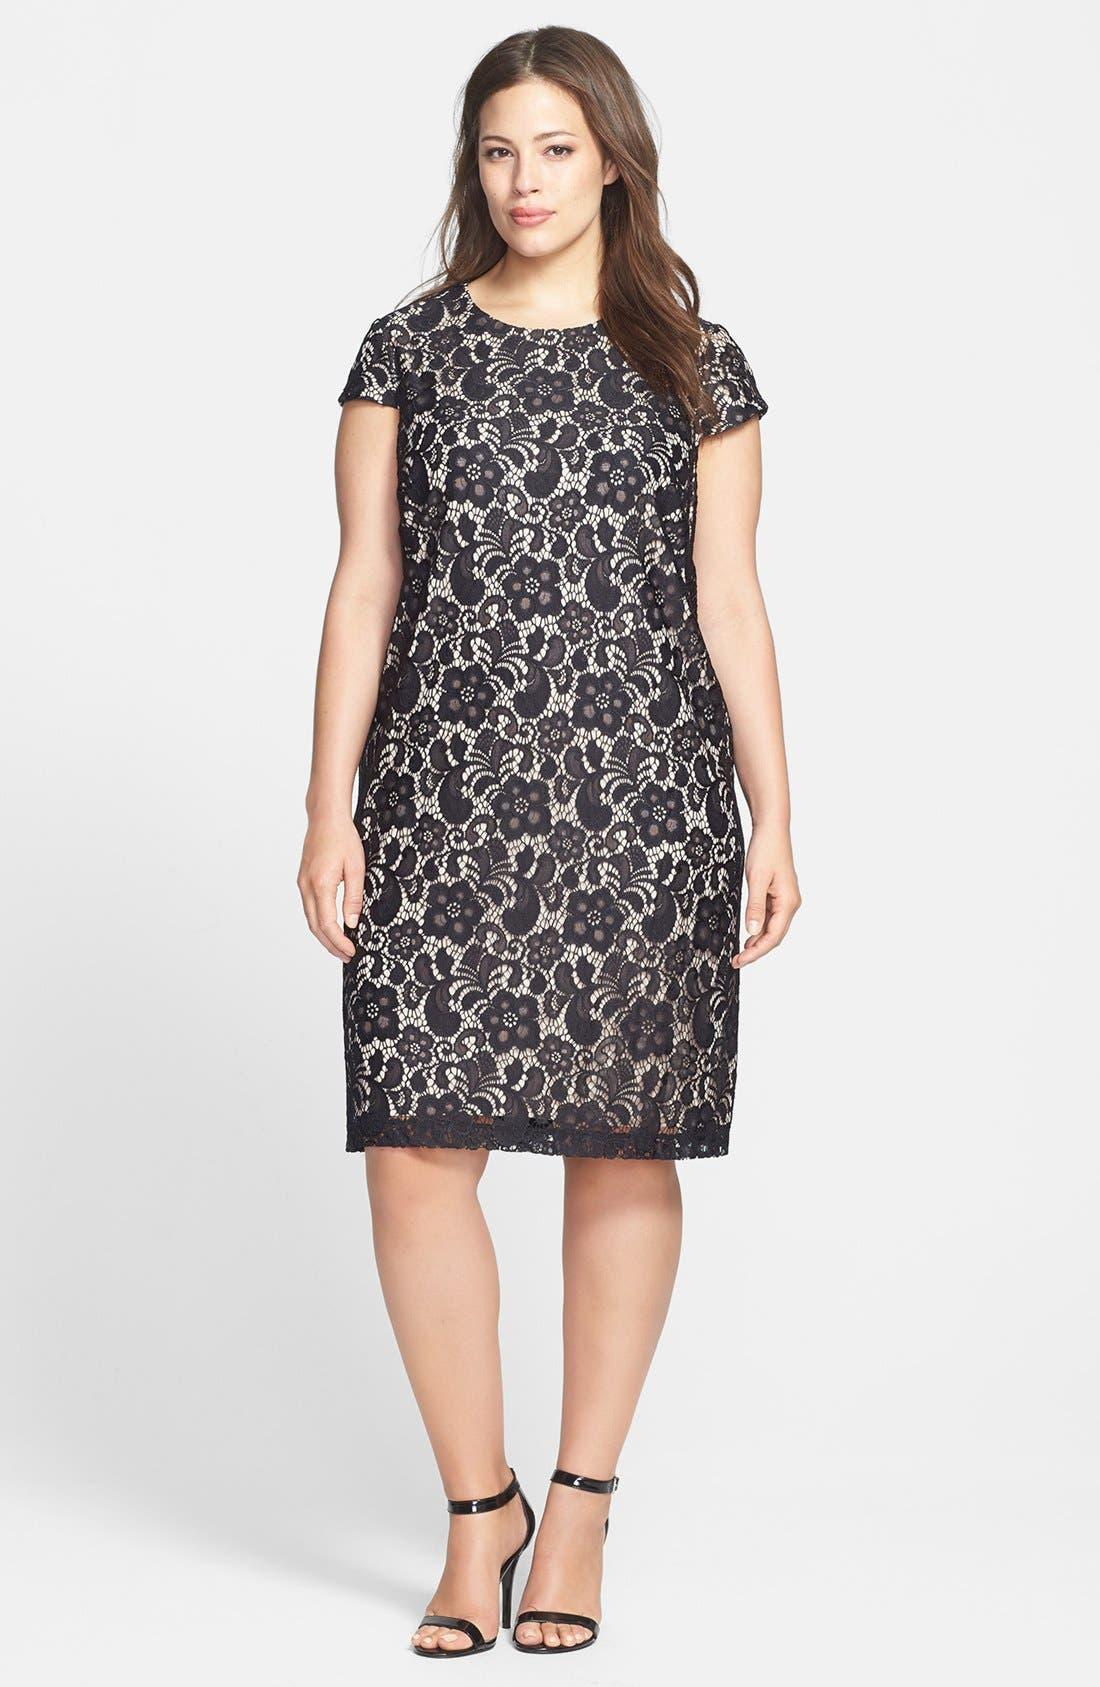 Alternate Image 1 Selected - Ivy & Blu Lace Shift Dress (Plus Size)